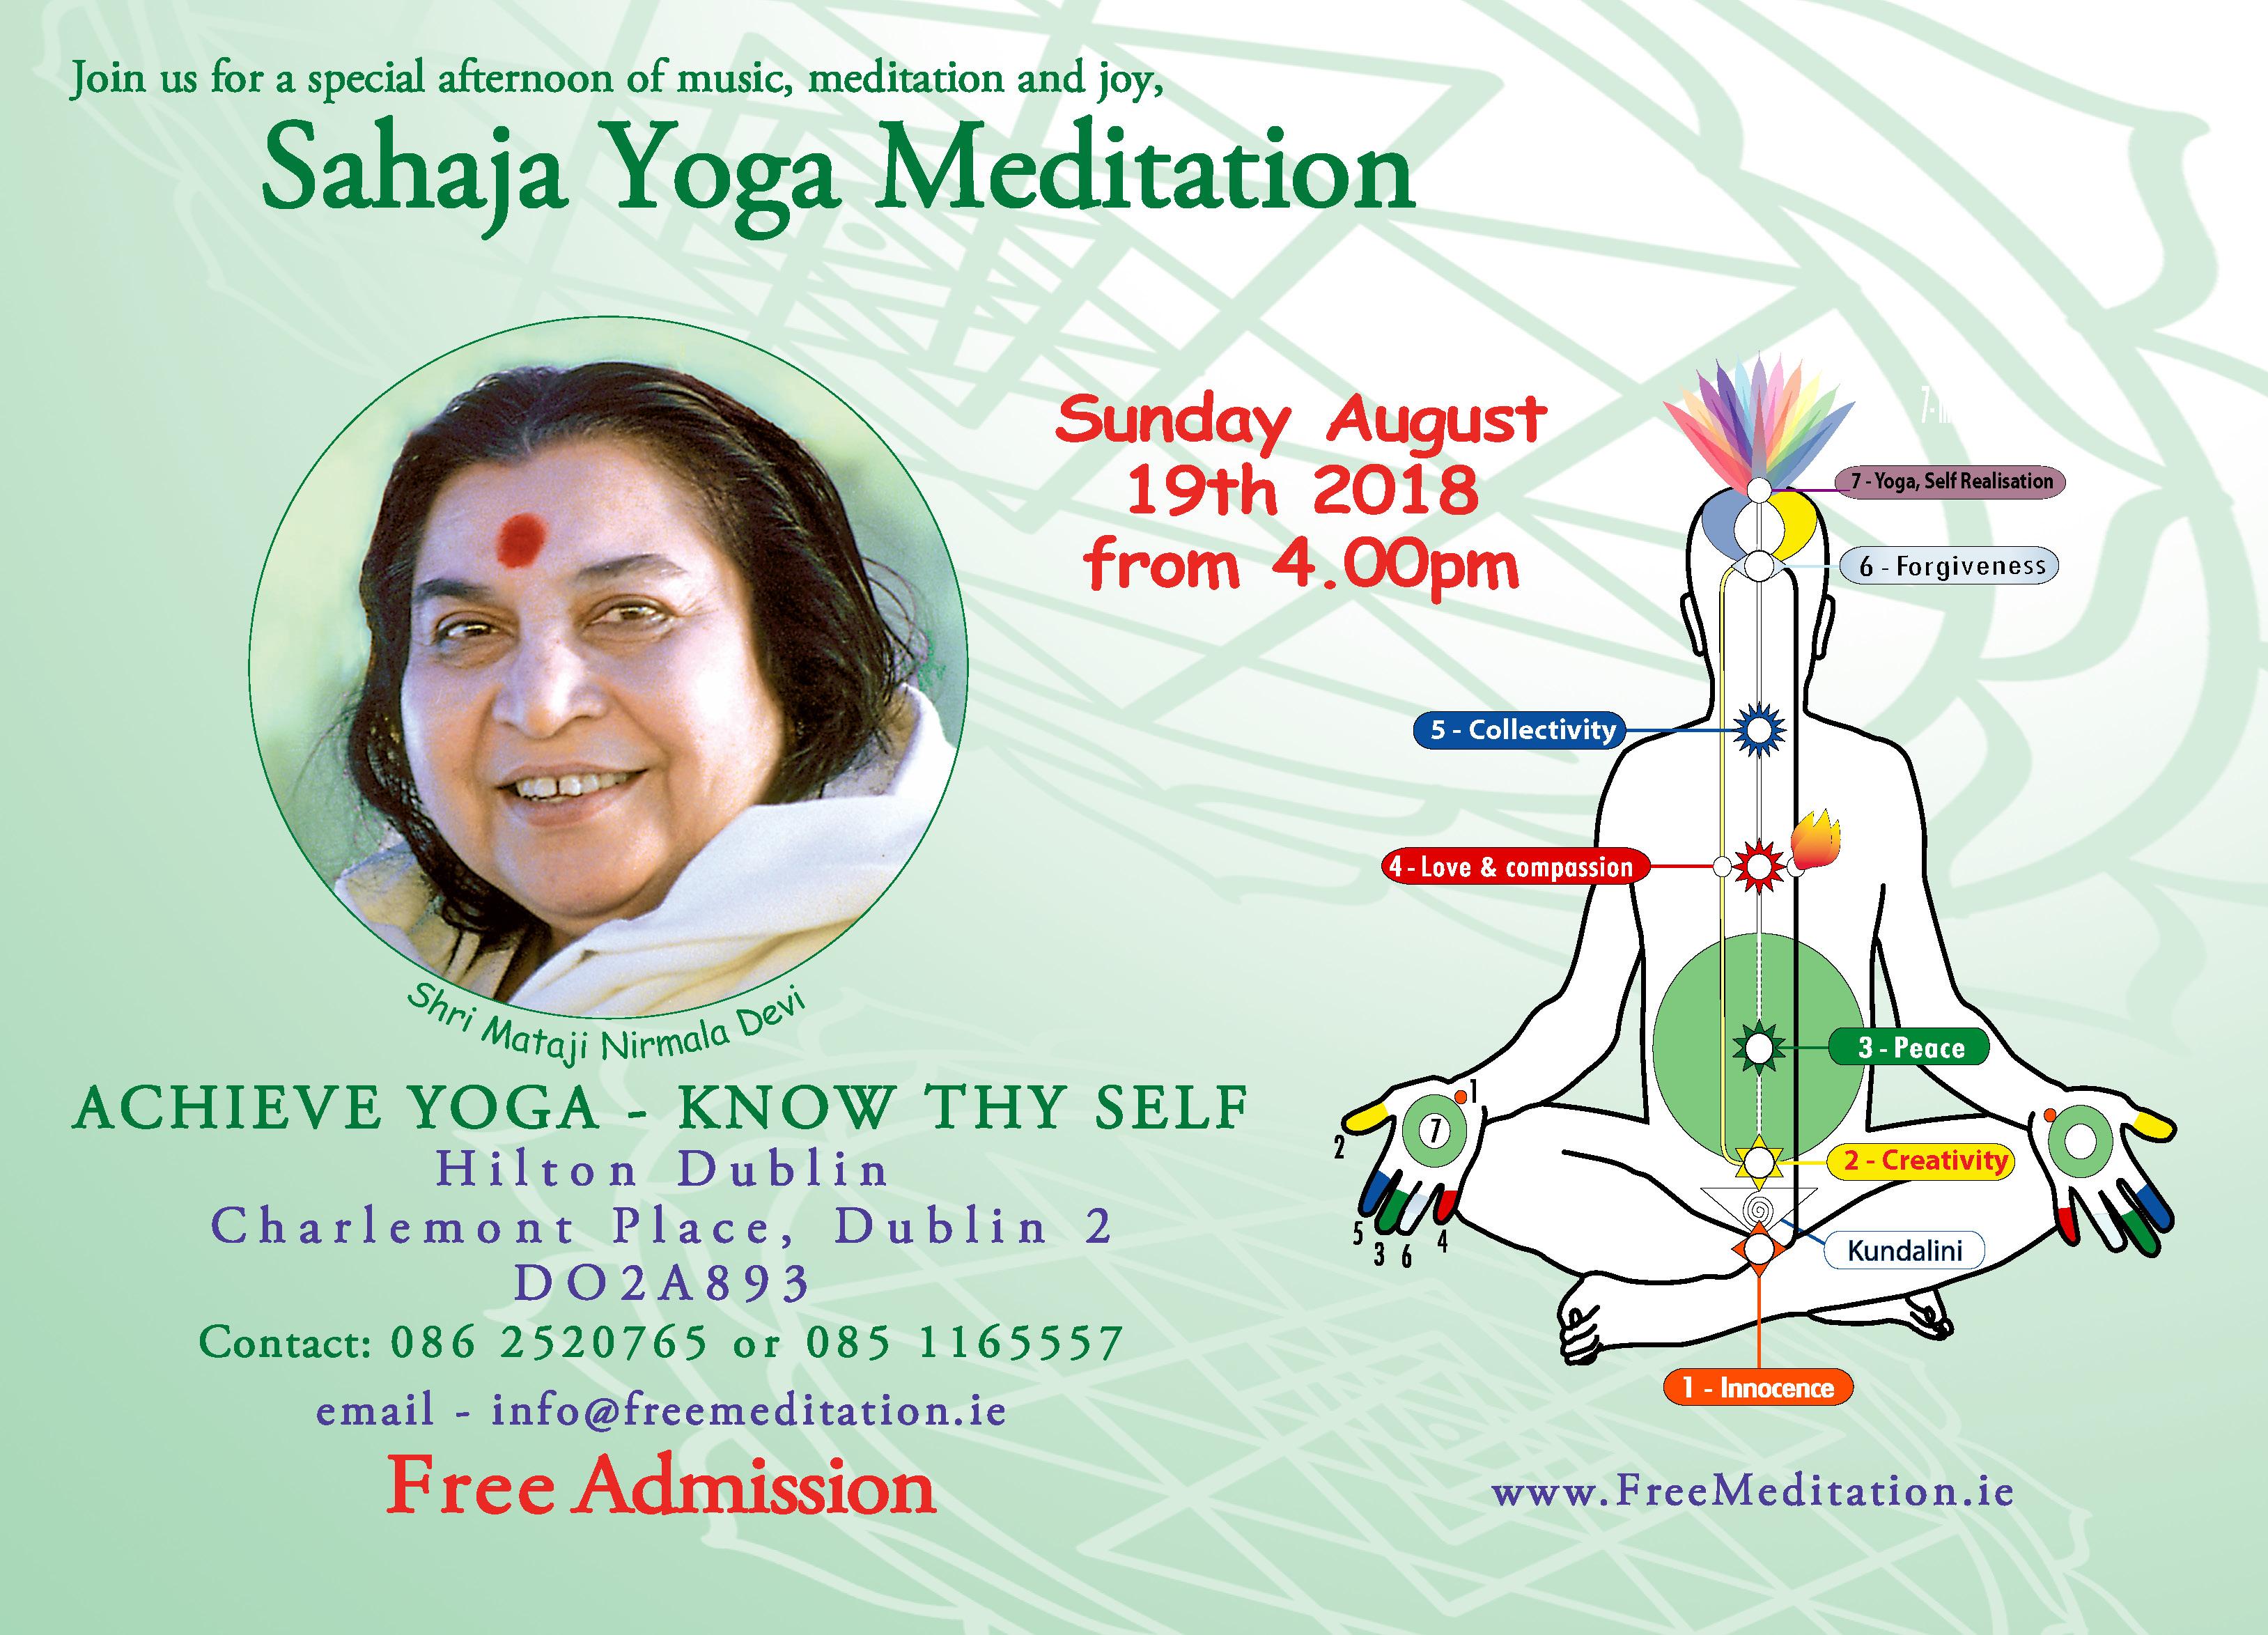 Free Music & Meditation – Achieve Yoga in Dublin